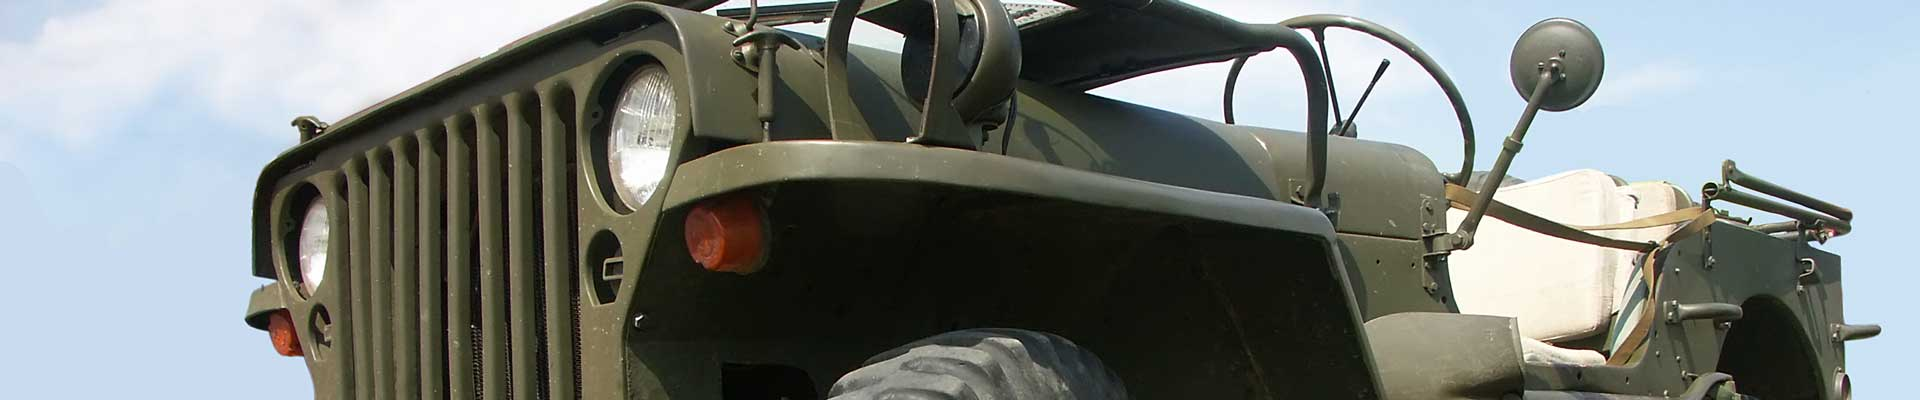 military-vehicle-insurance-military-jeep